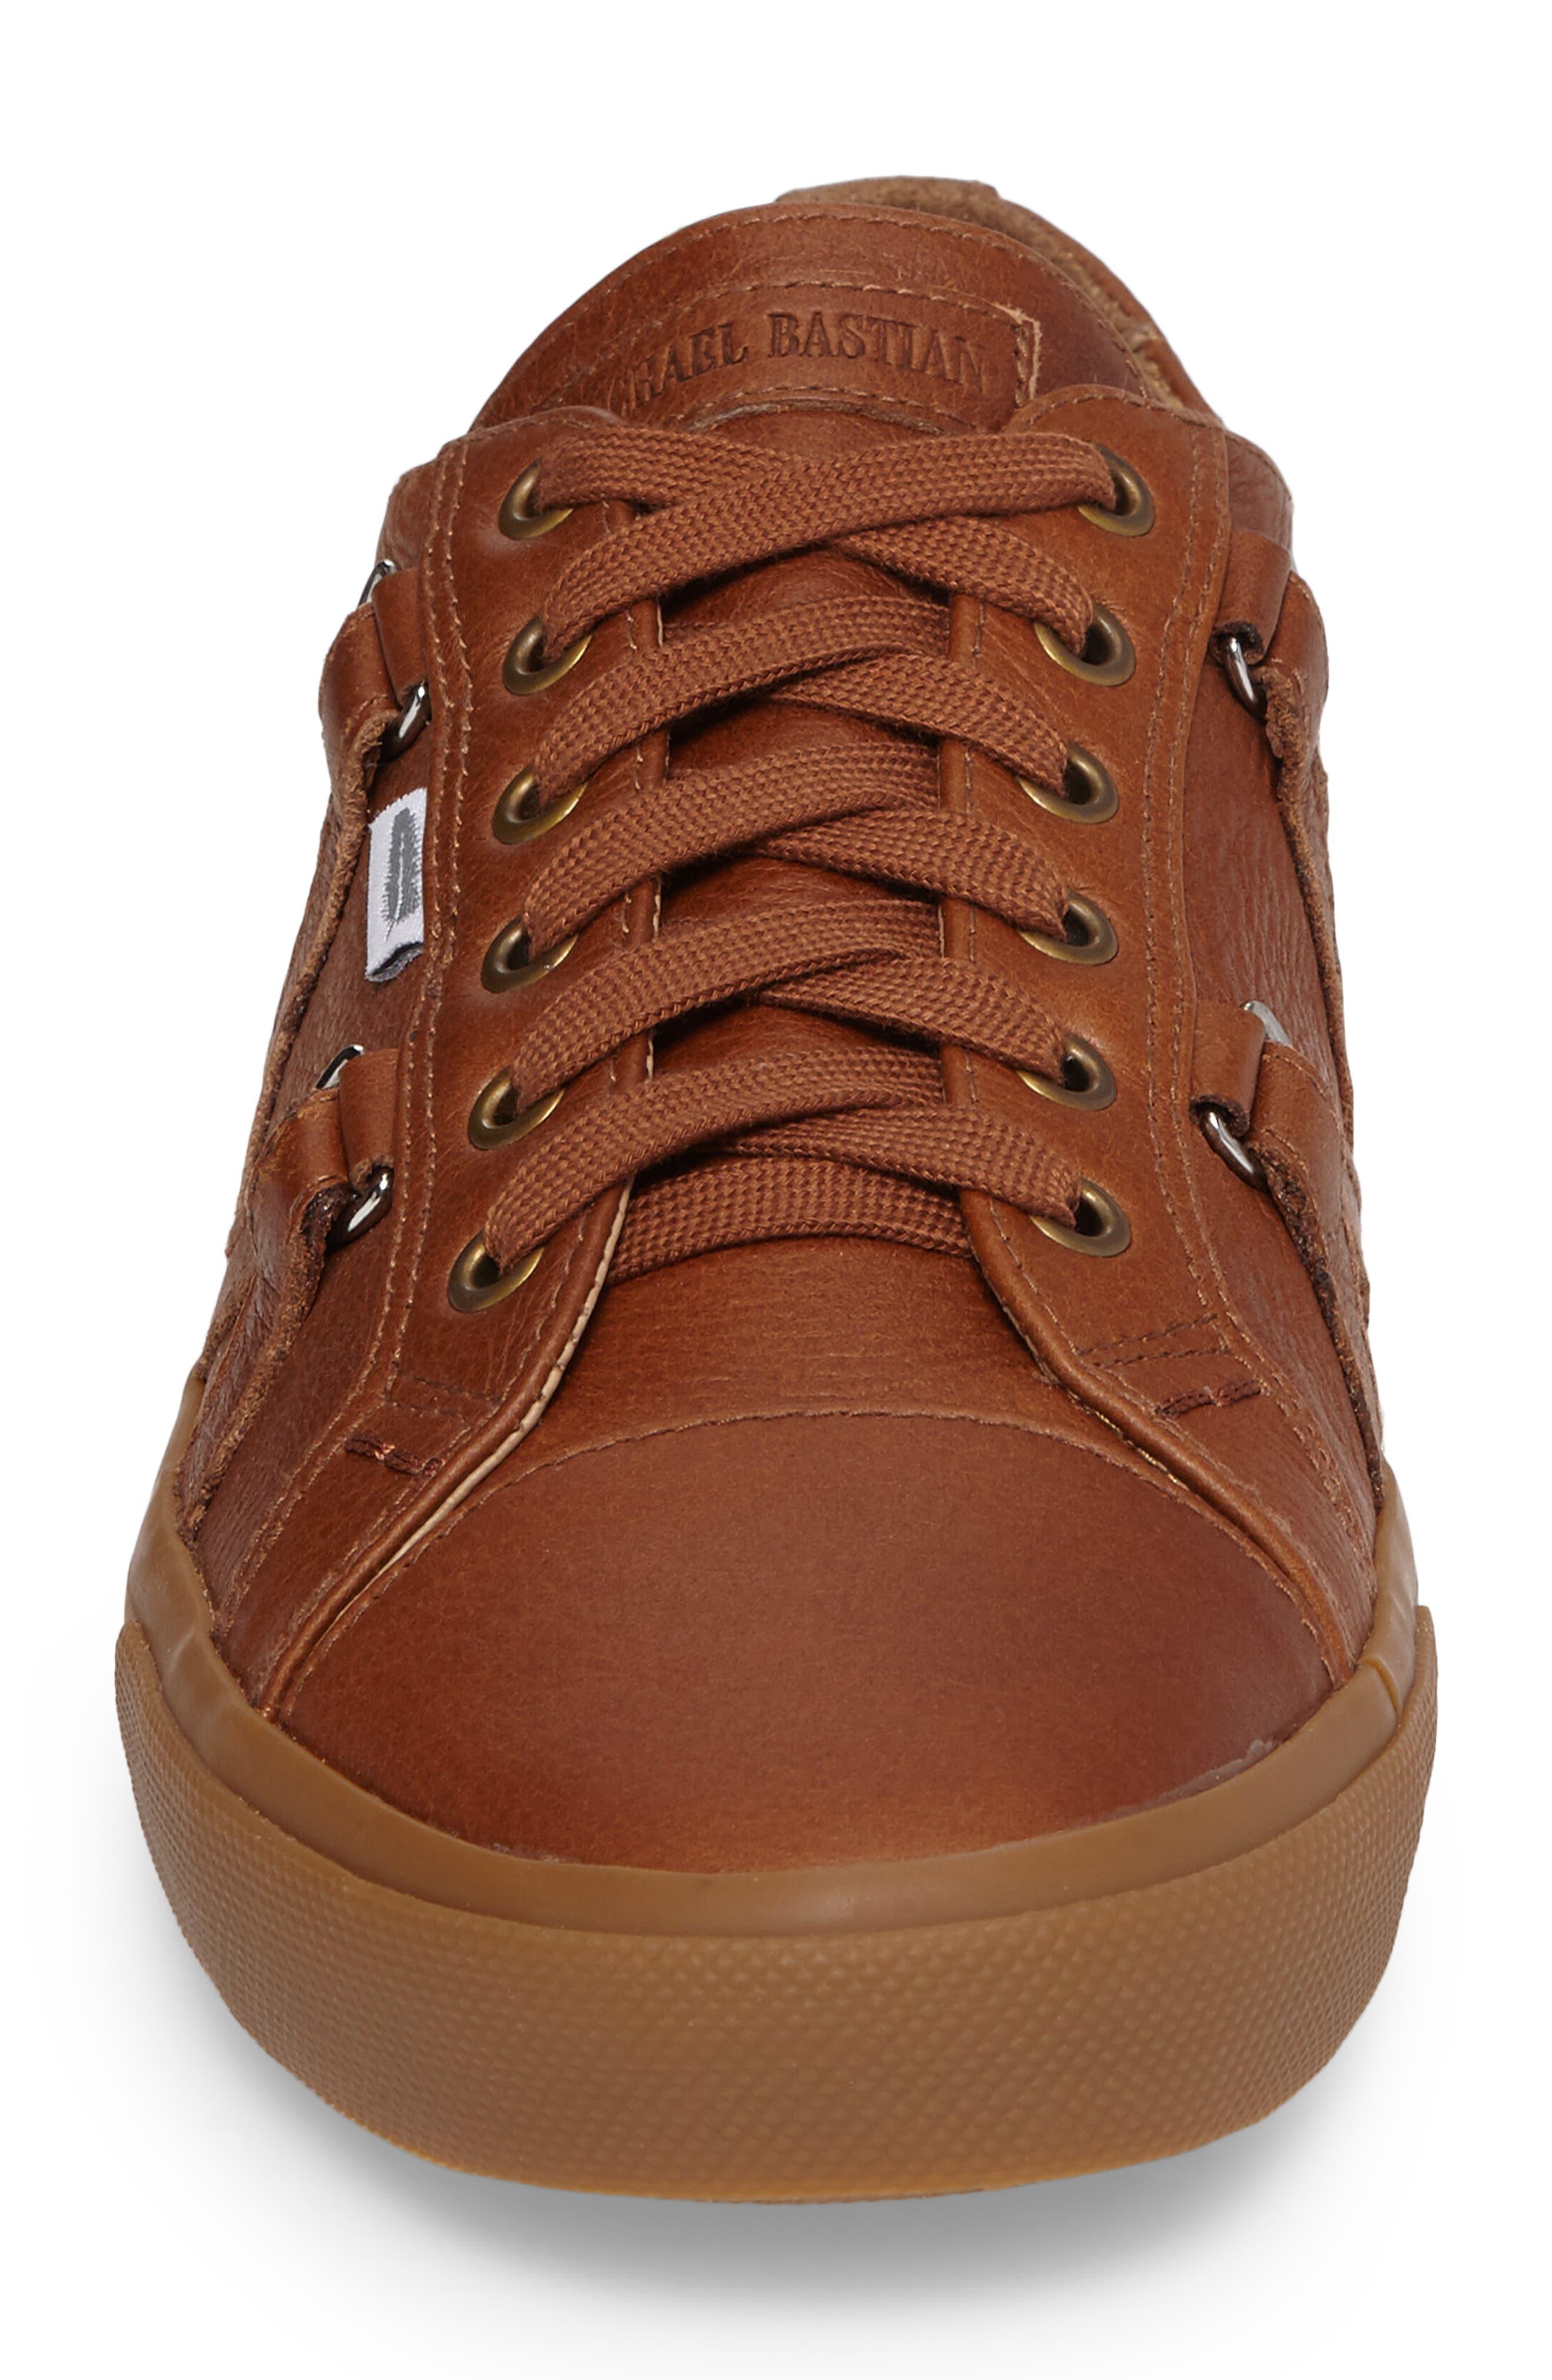 Alternate Image 4  - Michael Bastian Signature Sneaker (Men)